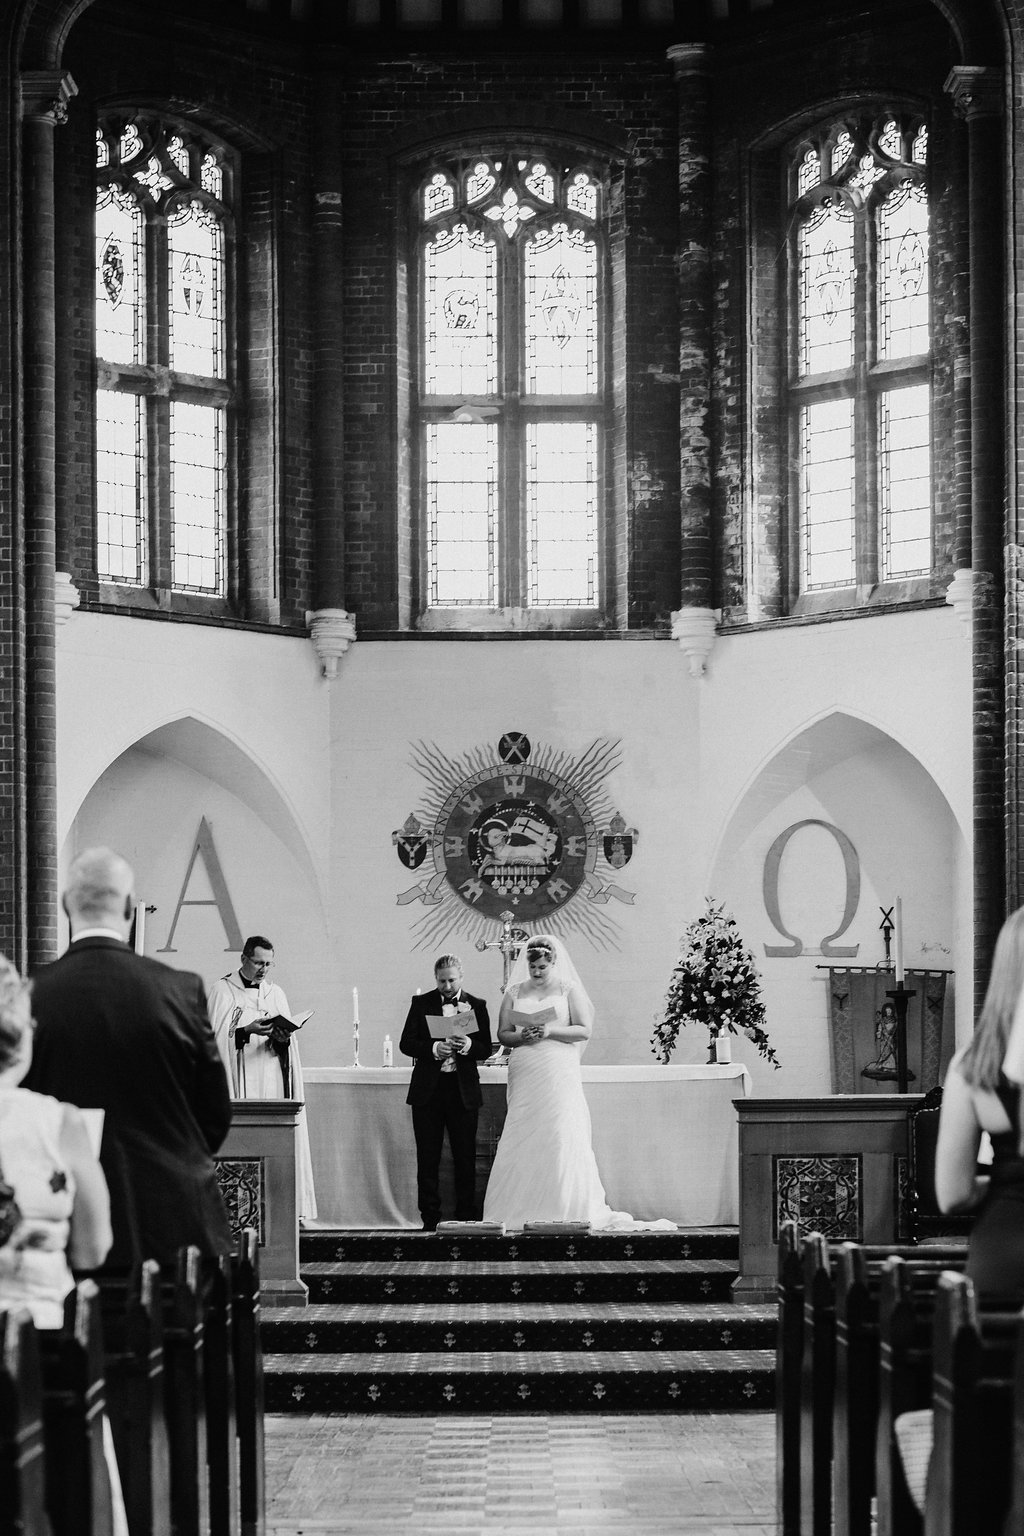 Your_Wedding_Day_0157.jpg